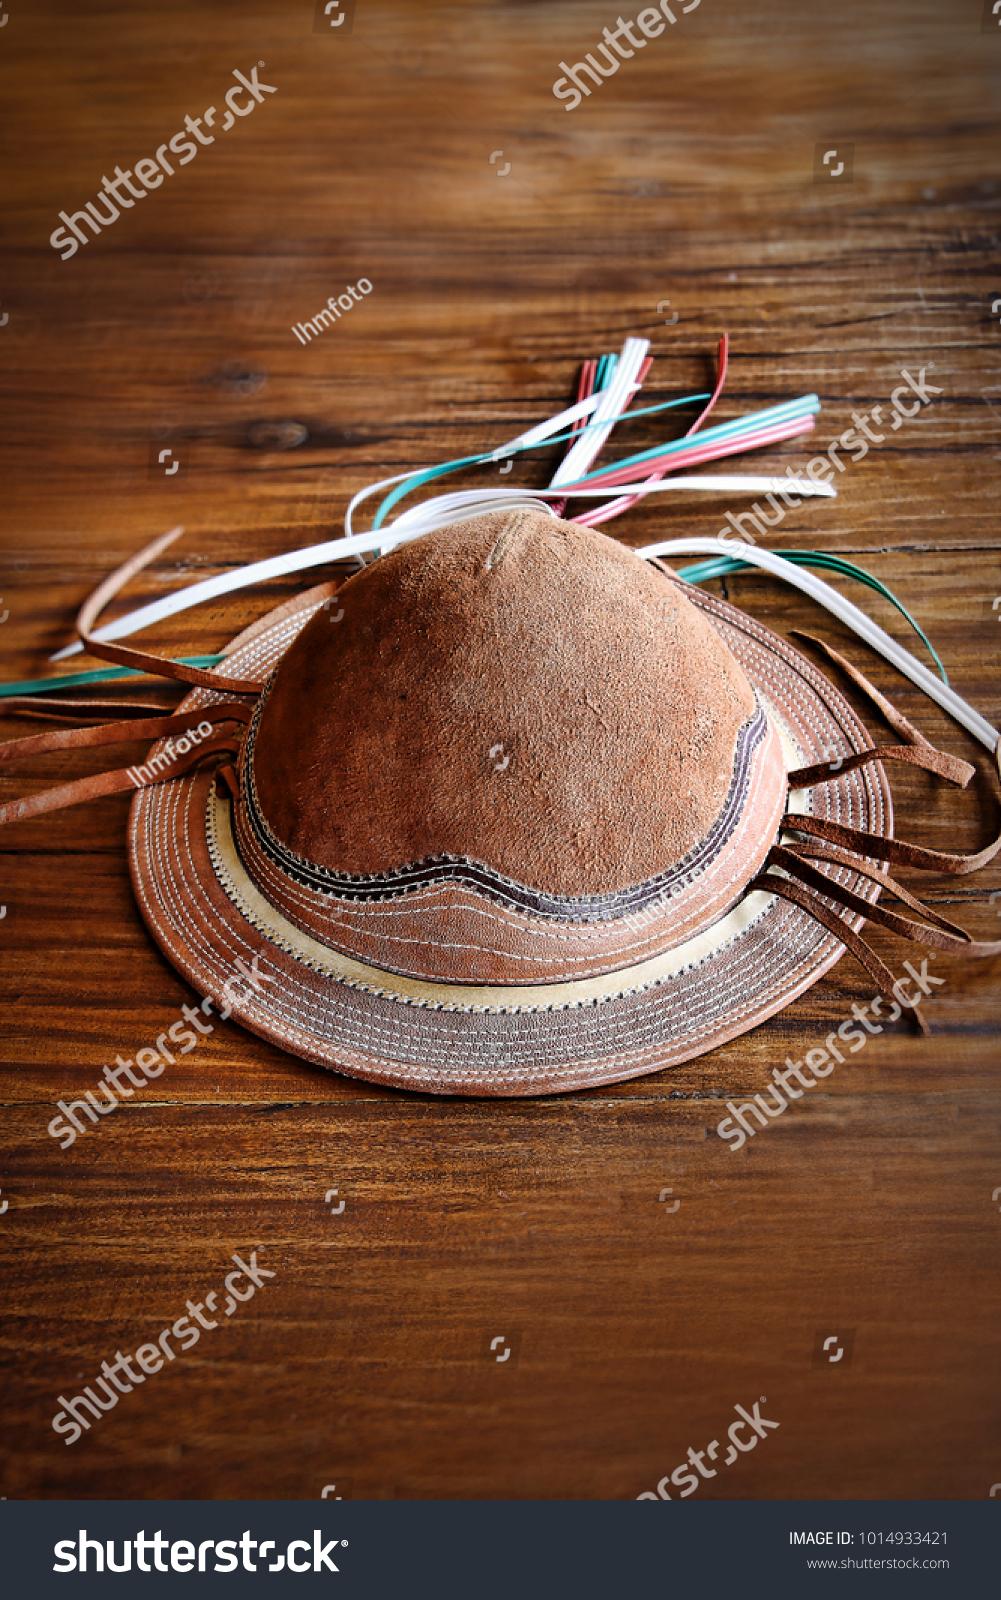 Brazilian Cowboy Hat Stock Photo (Edit Now) 1014933421 - Shutterstock b31ec1ff62c